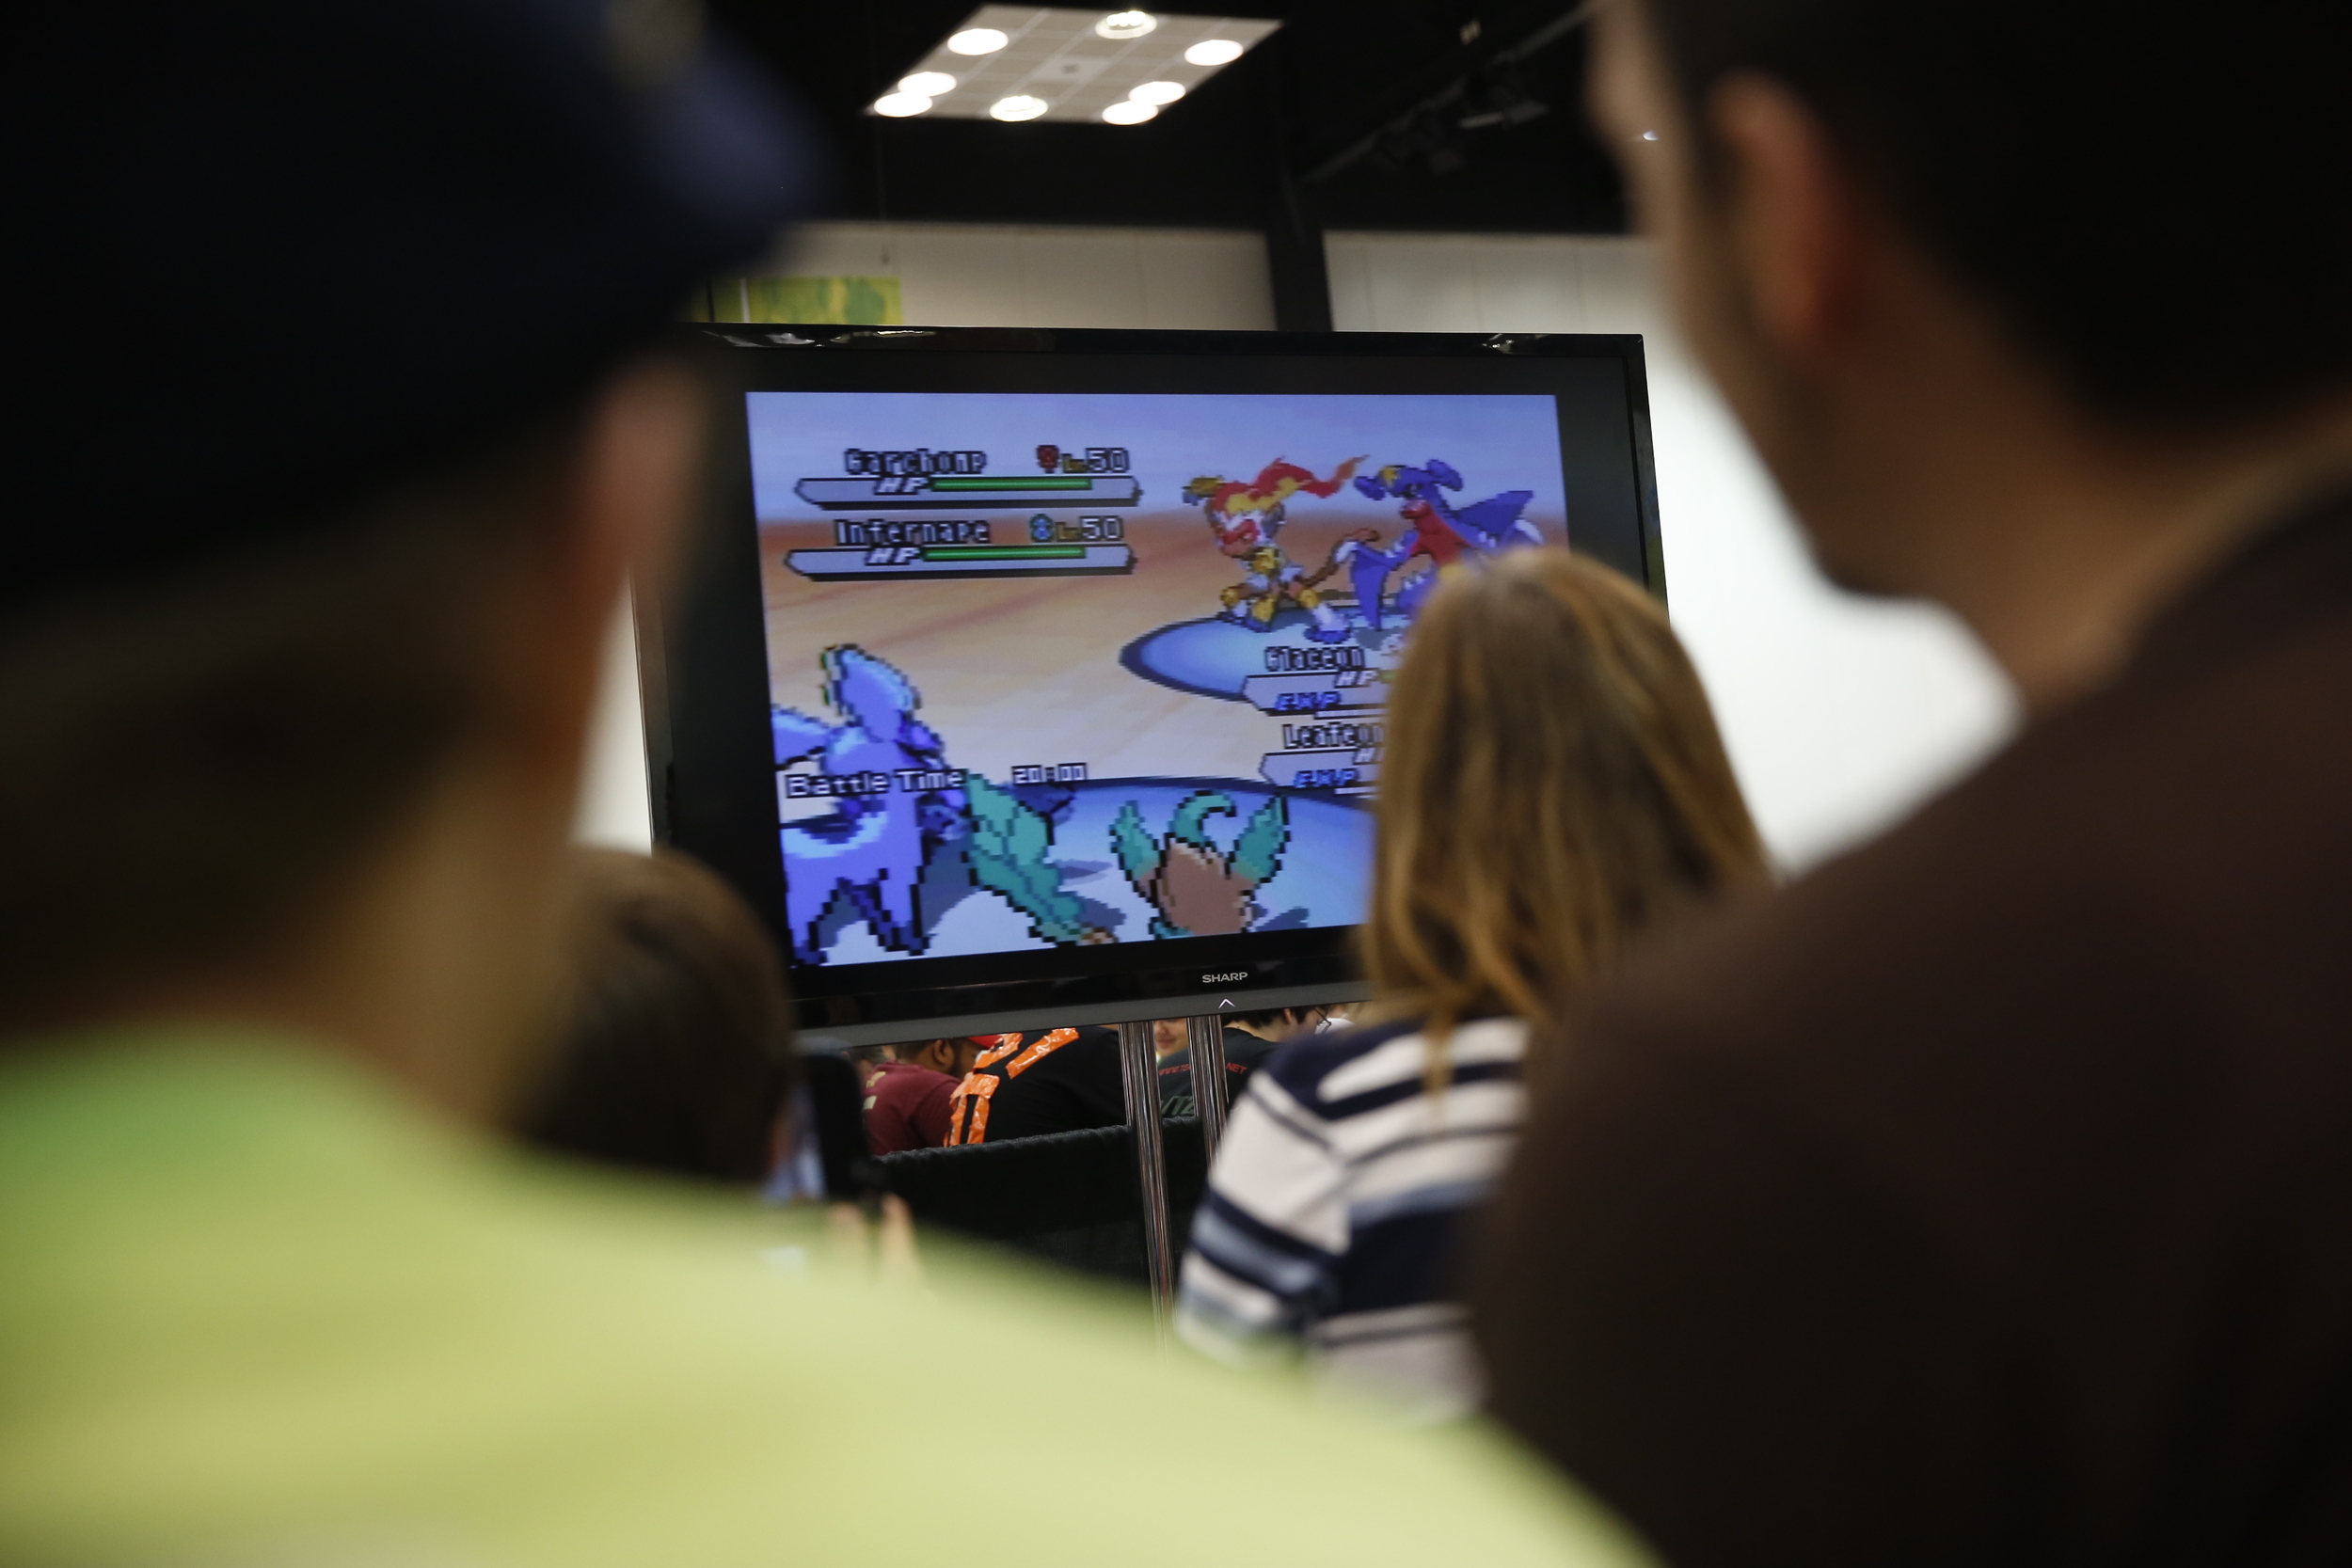 2013 U.S. Pokémon National Championships Image 10.JPG